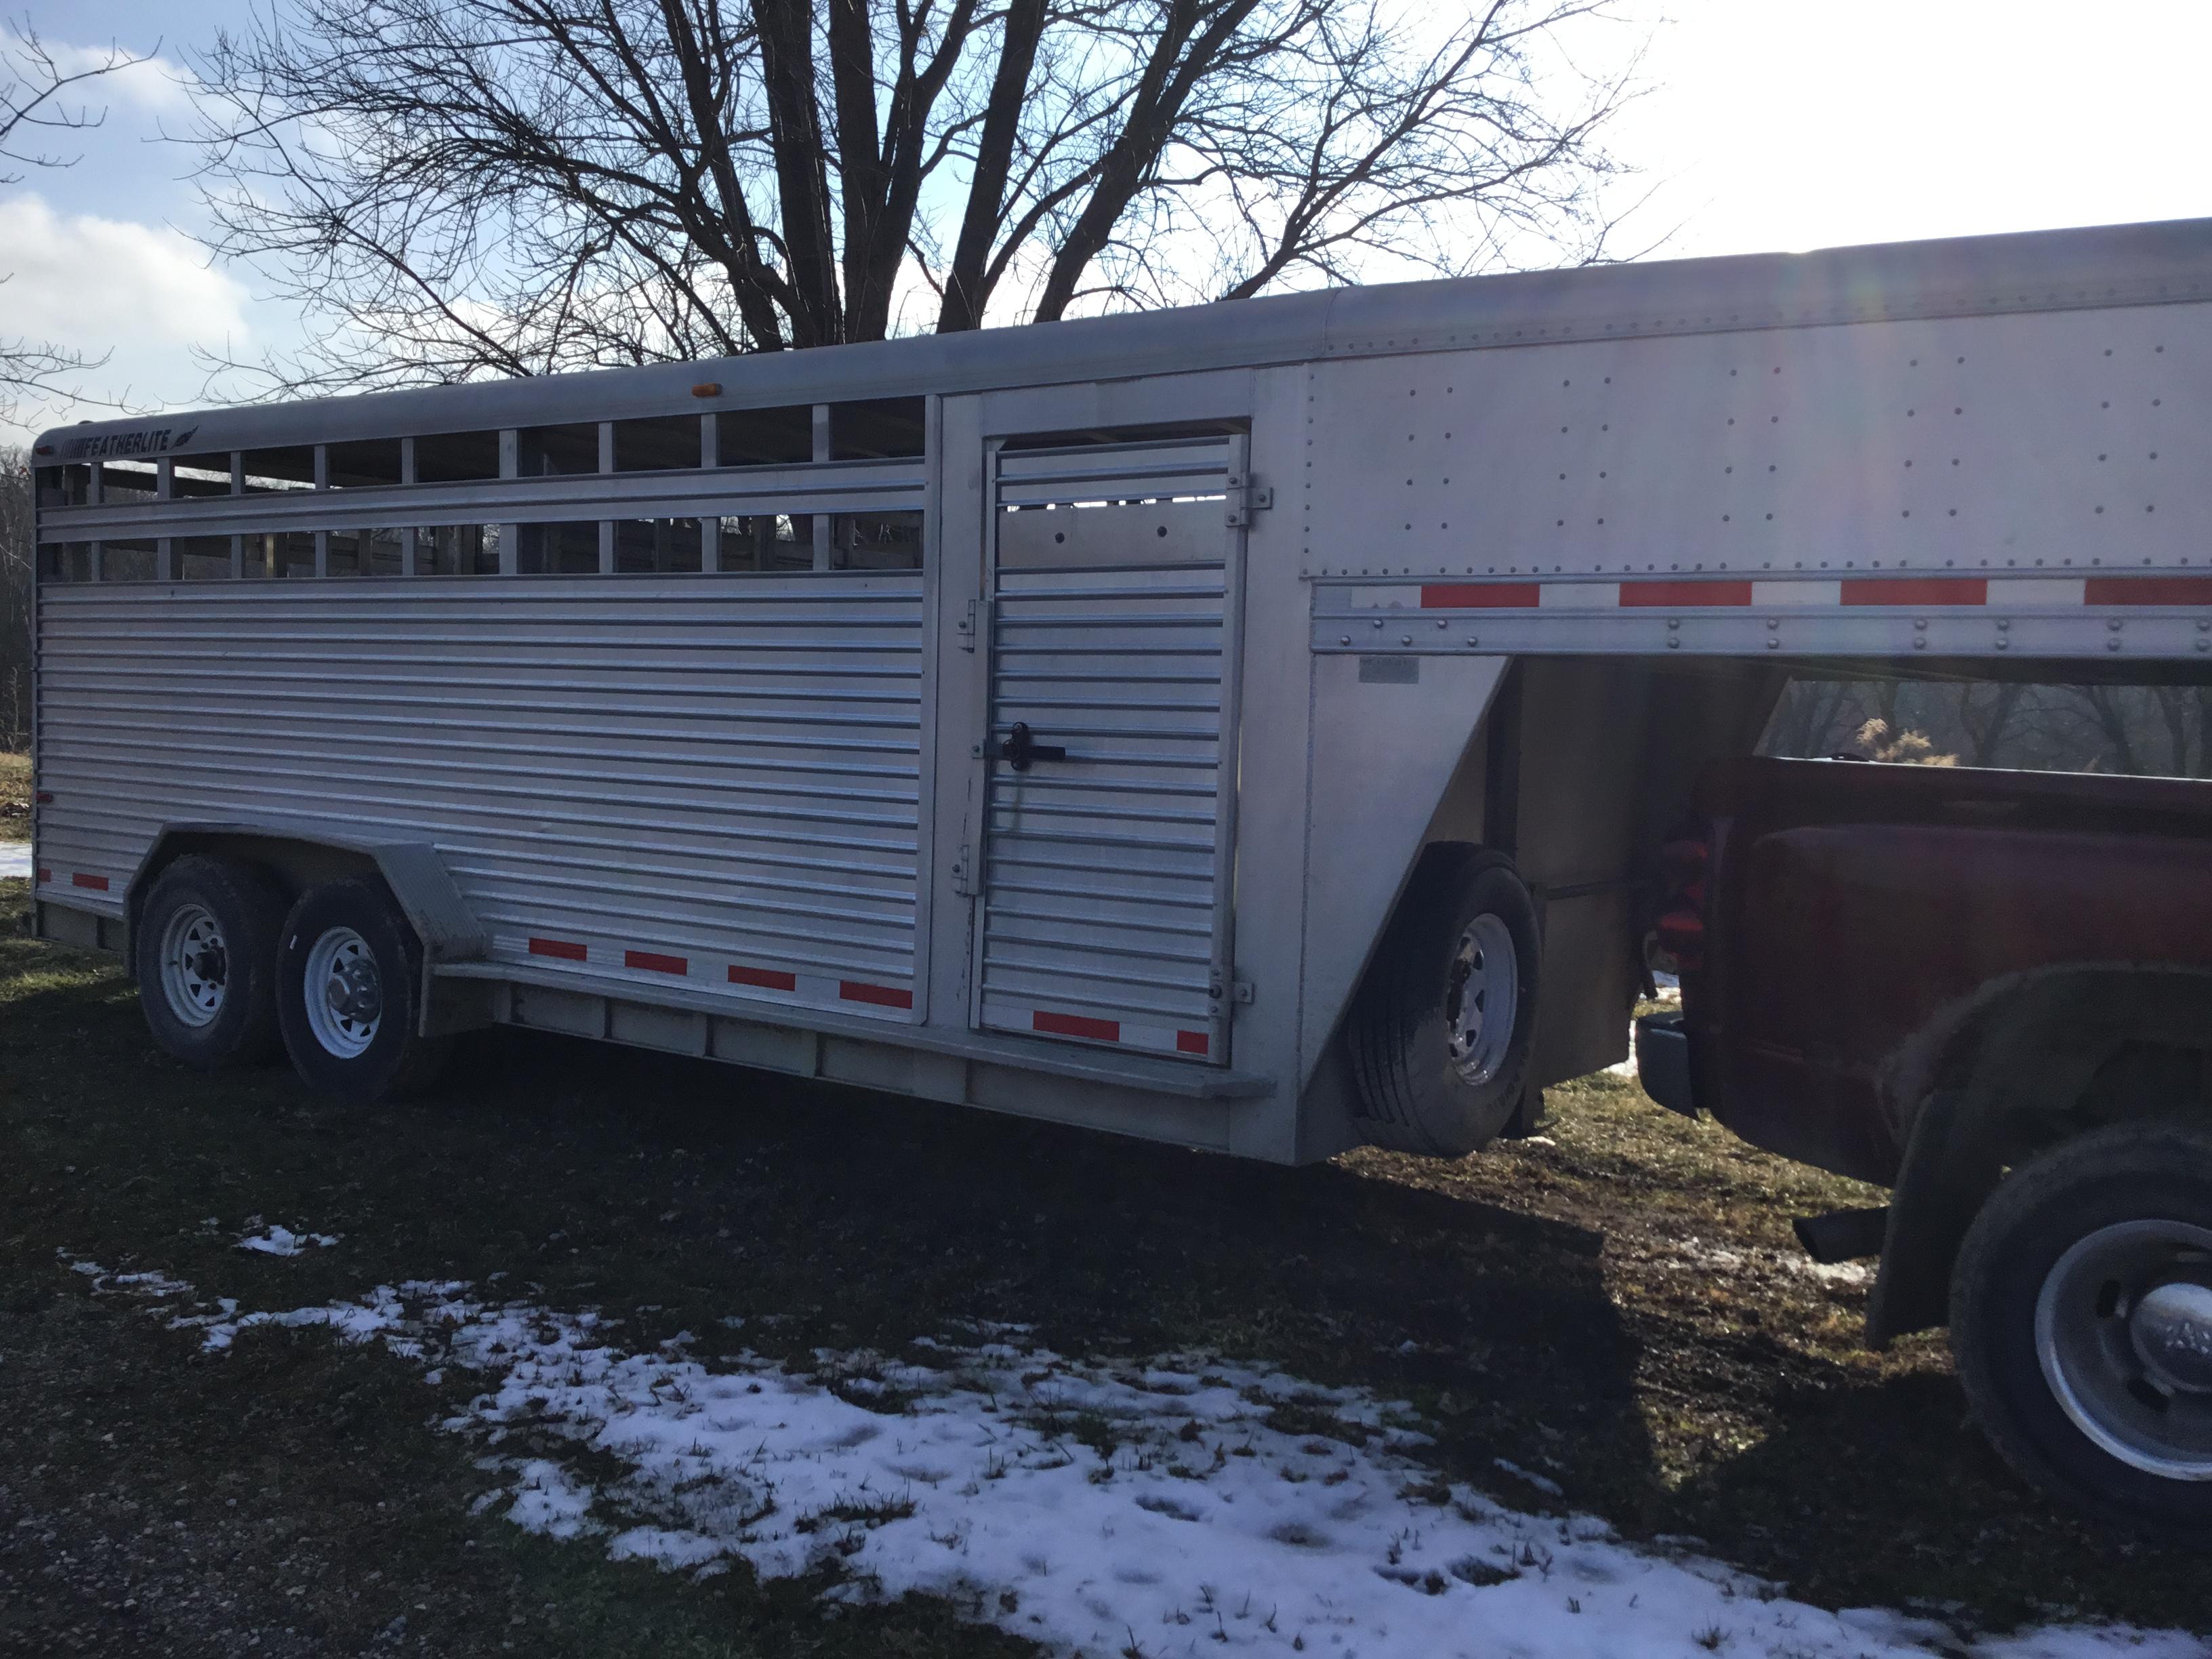 Lot 15 - 2000 Featherlite 7x20 Aluminum Livestock Trailer, 2-7,000# Axles, Center Cut Gate, (Sharp)